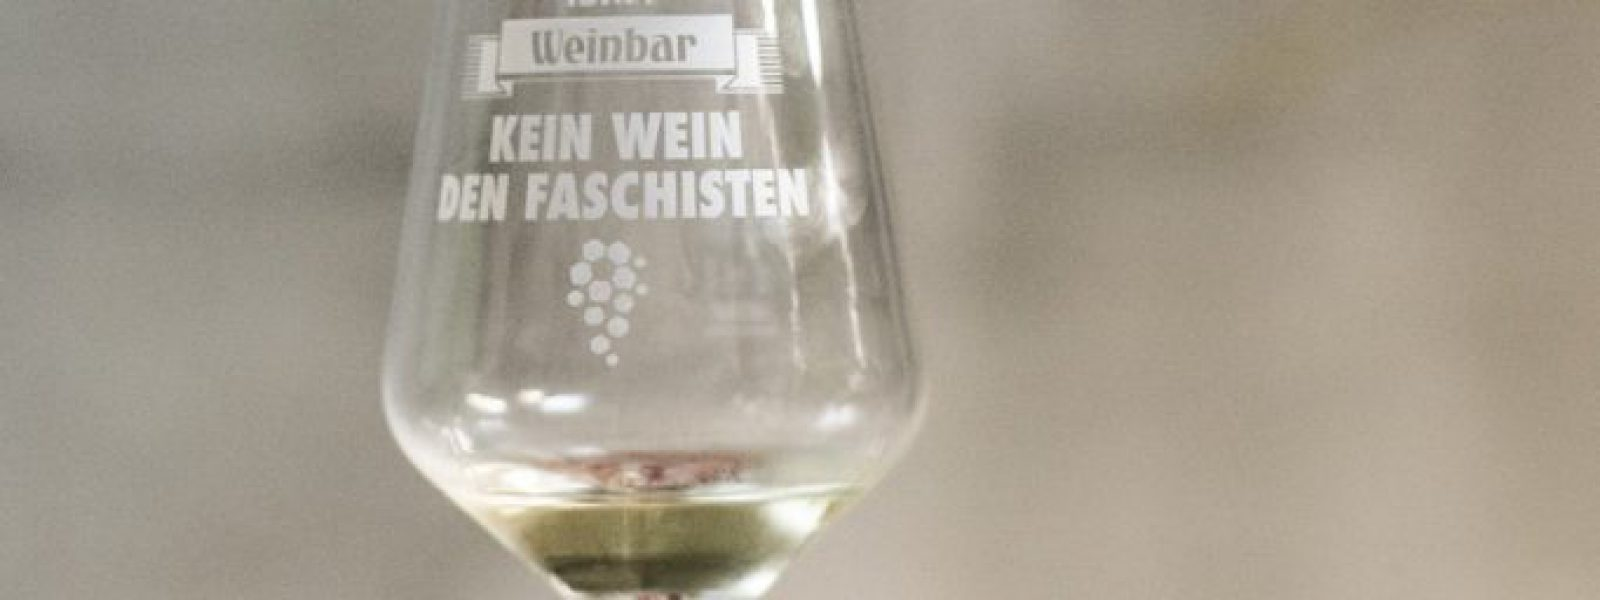 Weinfest gegen Rassismus (Fotos Sabrina Adeline Nagel) - 34